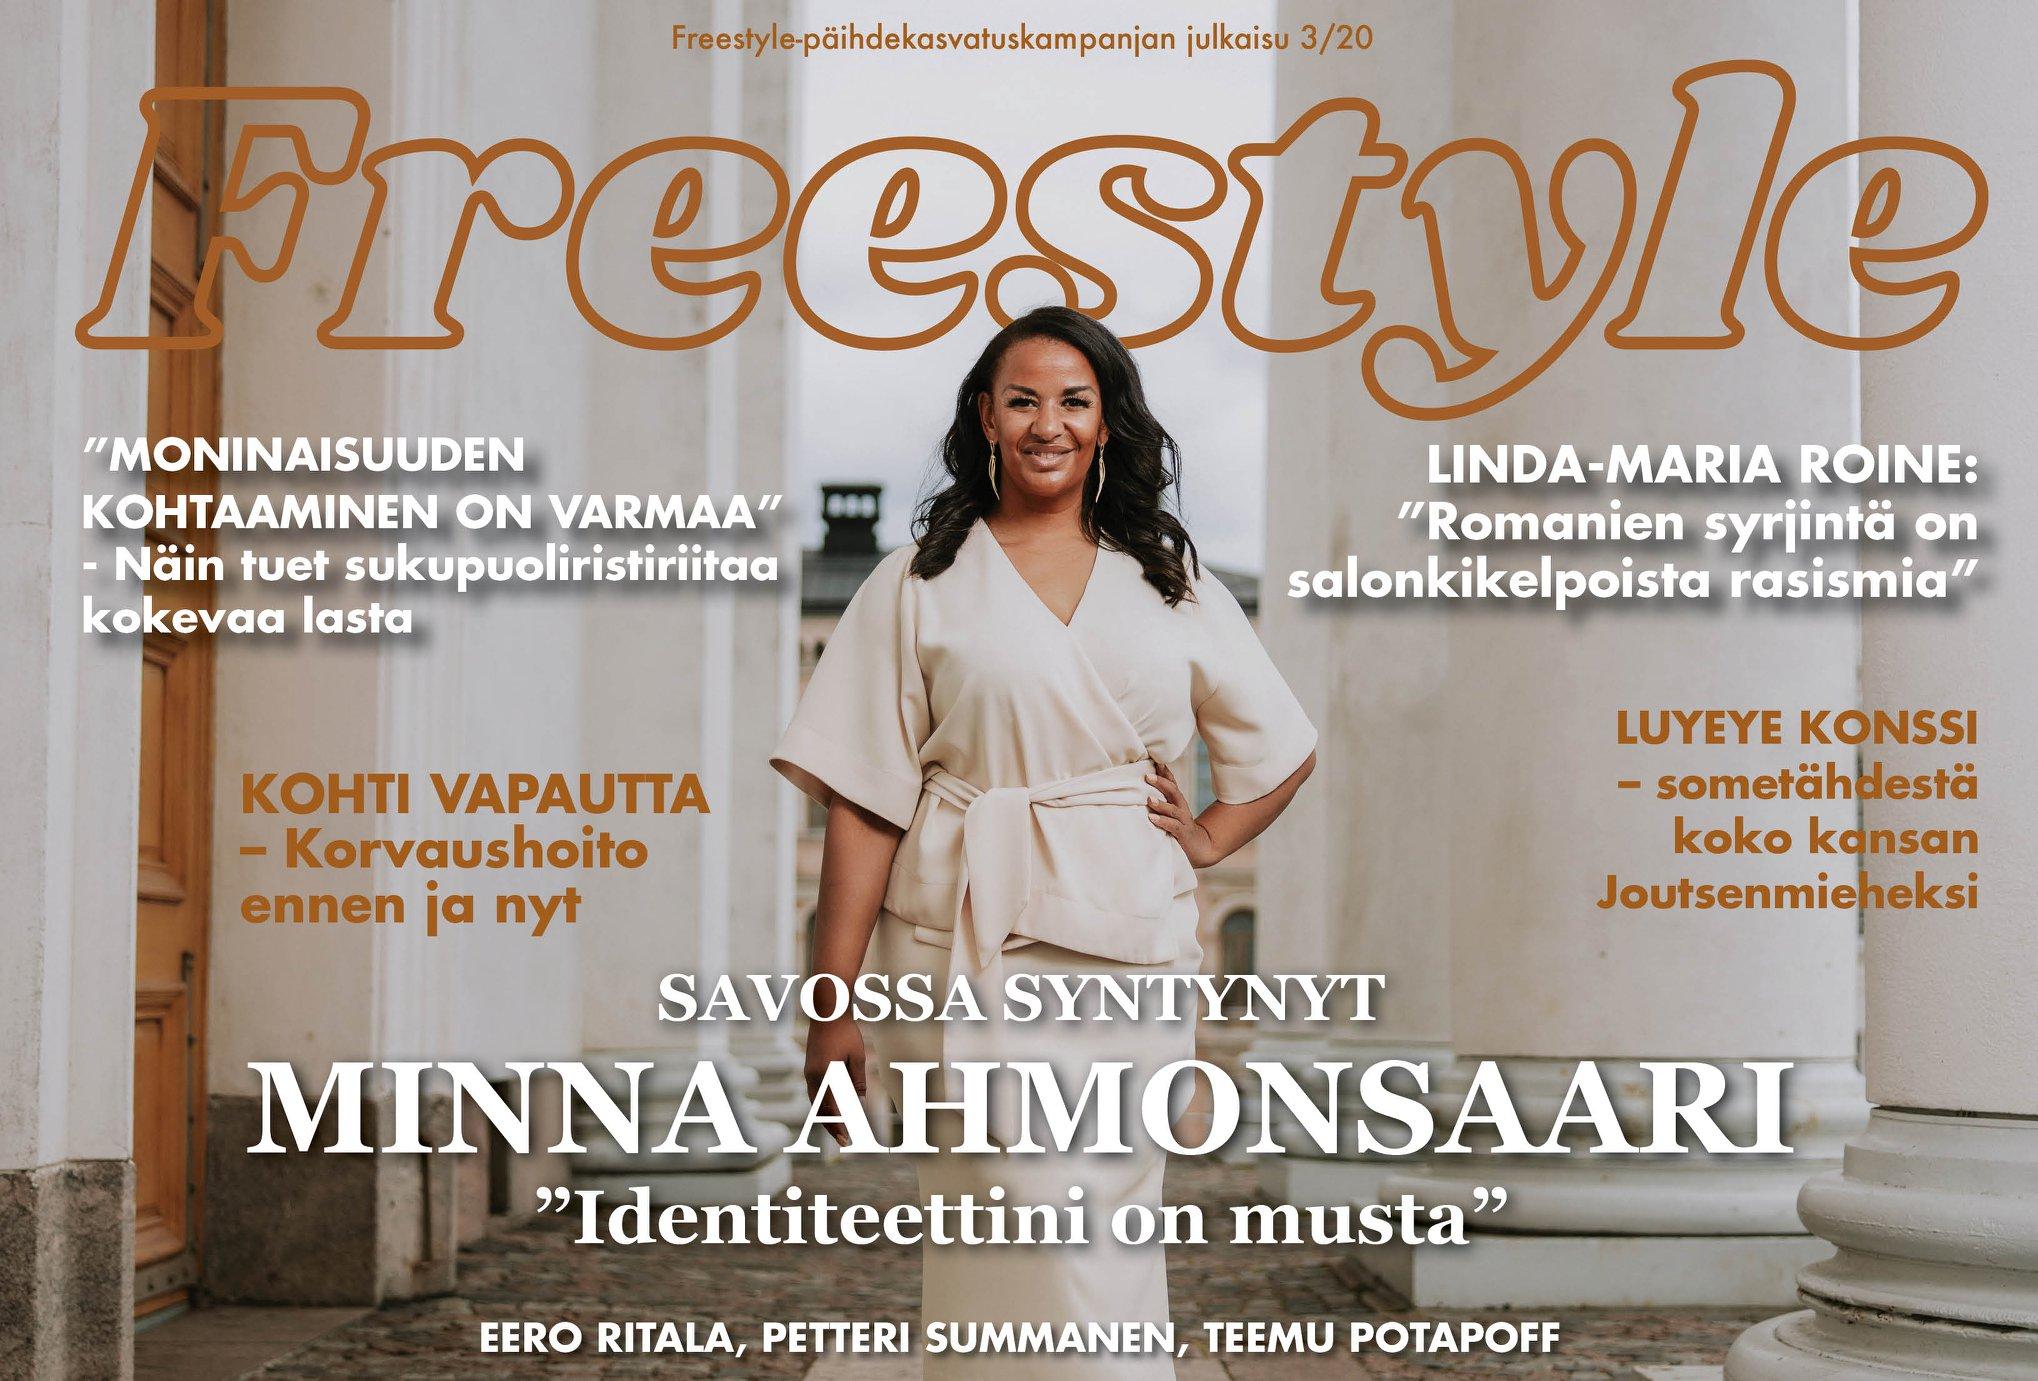 Minna Ahmonsaari